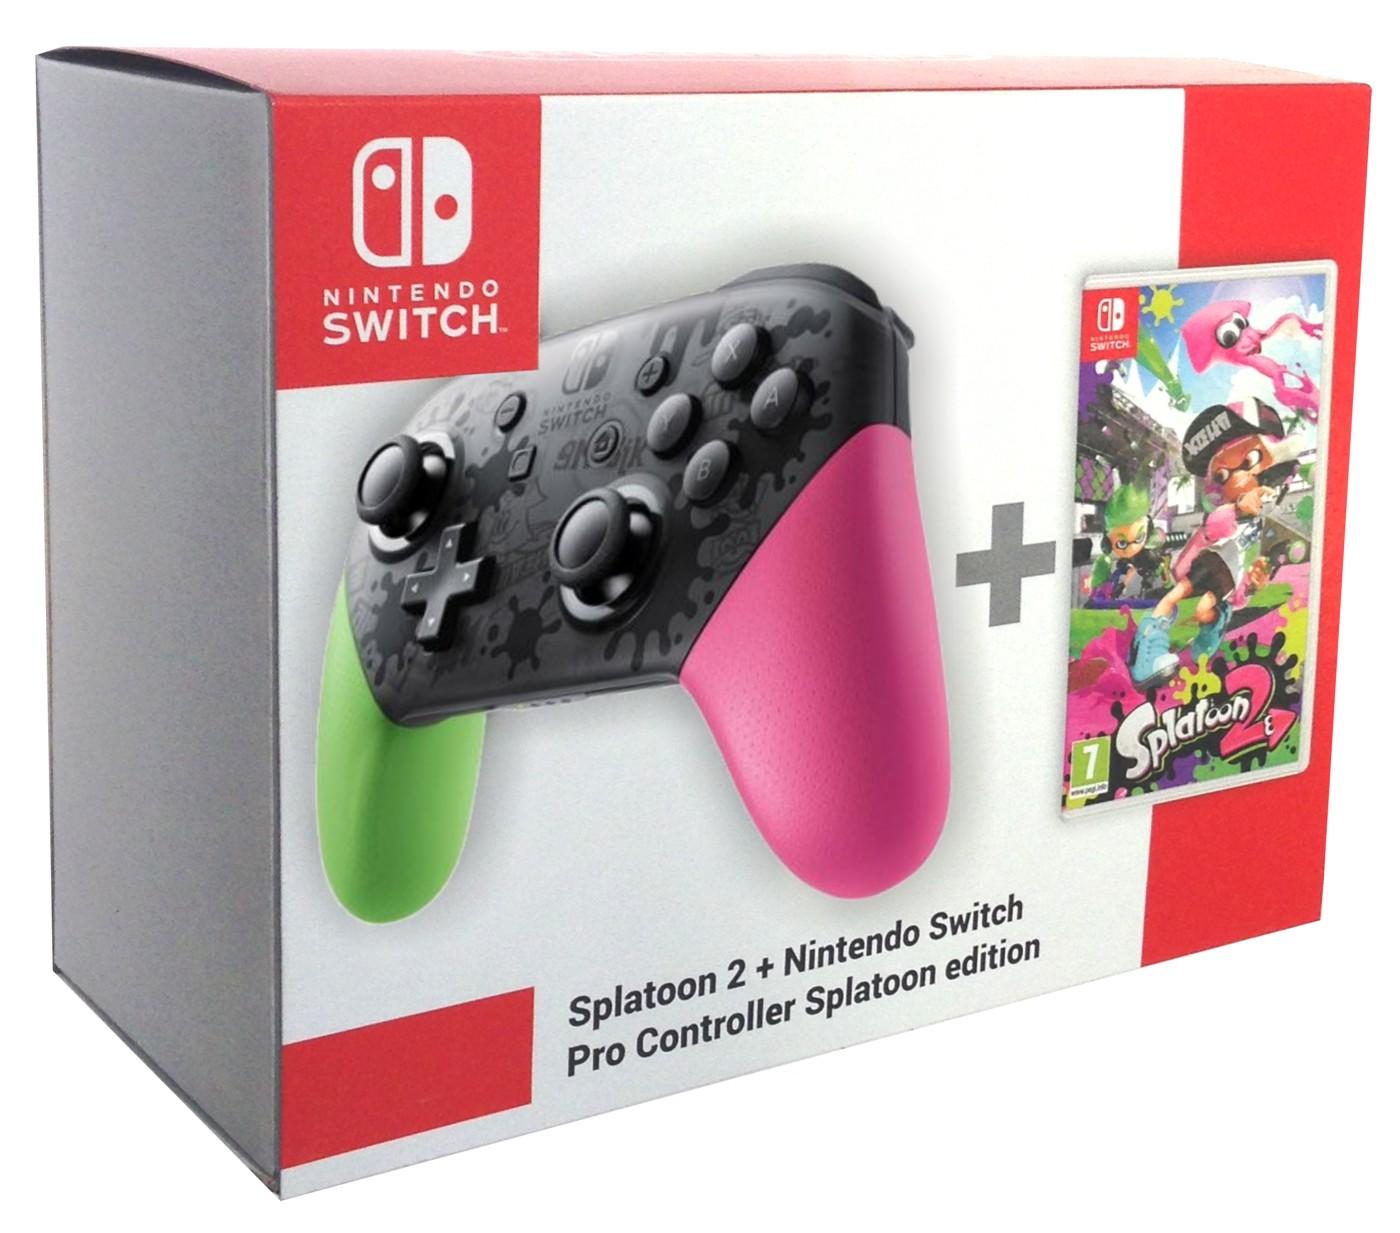 Nintendo SWITCH Pro Controller (Splatoon edition) + Splatoon 2